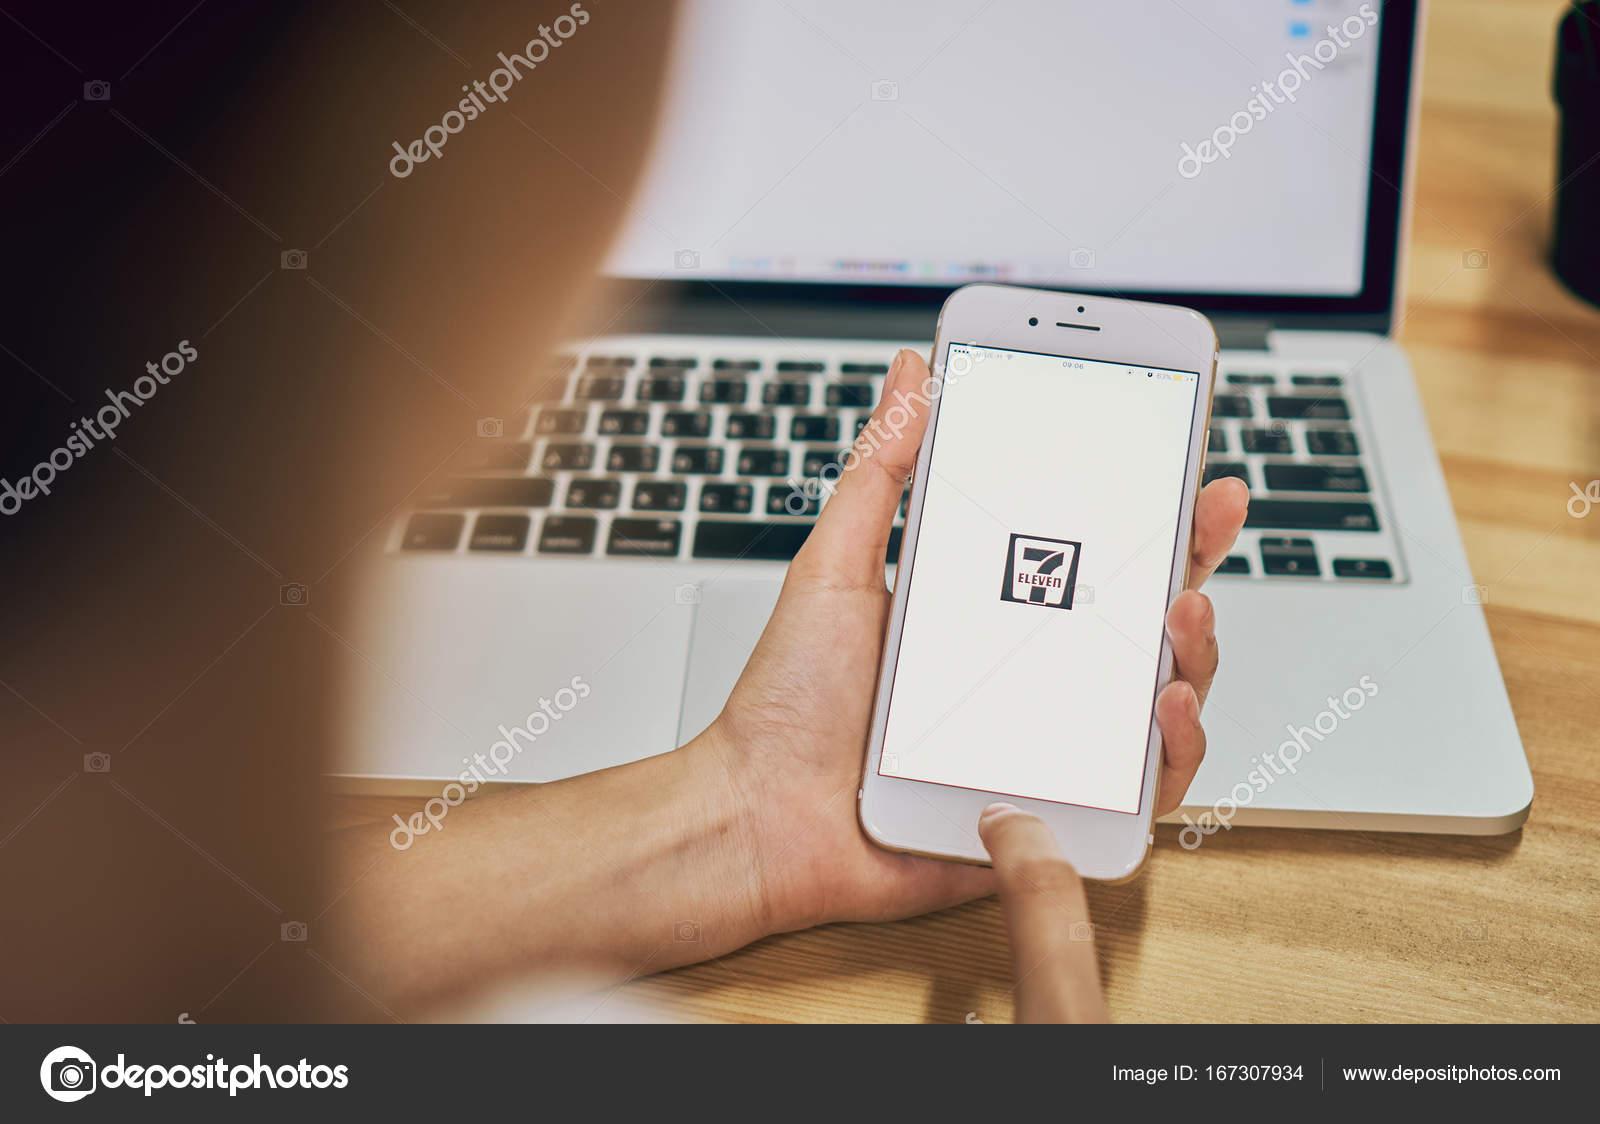 Bangkok, Thailand - September 25, 2017 : Woman holding phone